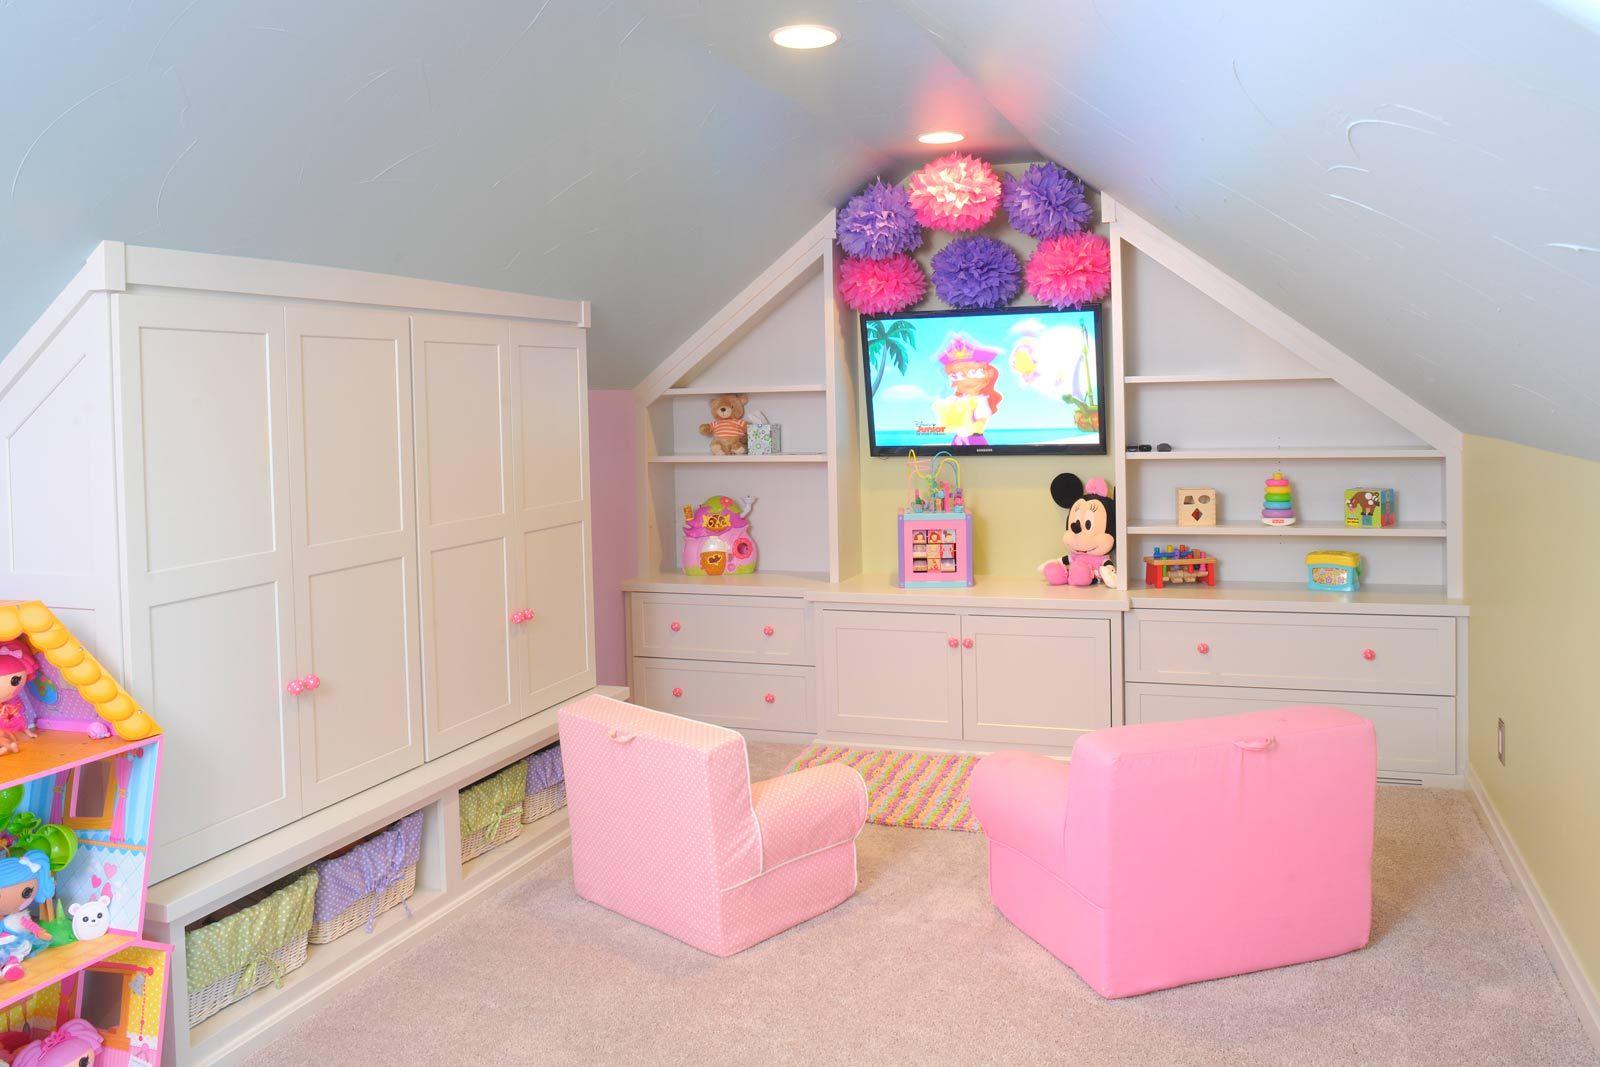 Fun And Creative Kids Playroom Ideas Kid Bean Bag Chairs With